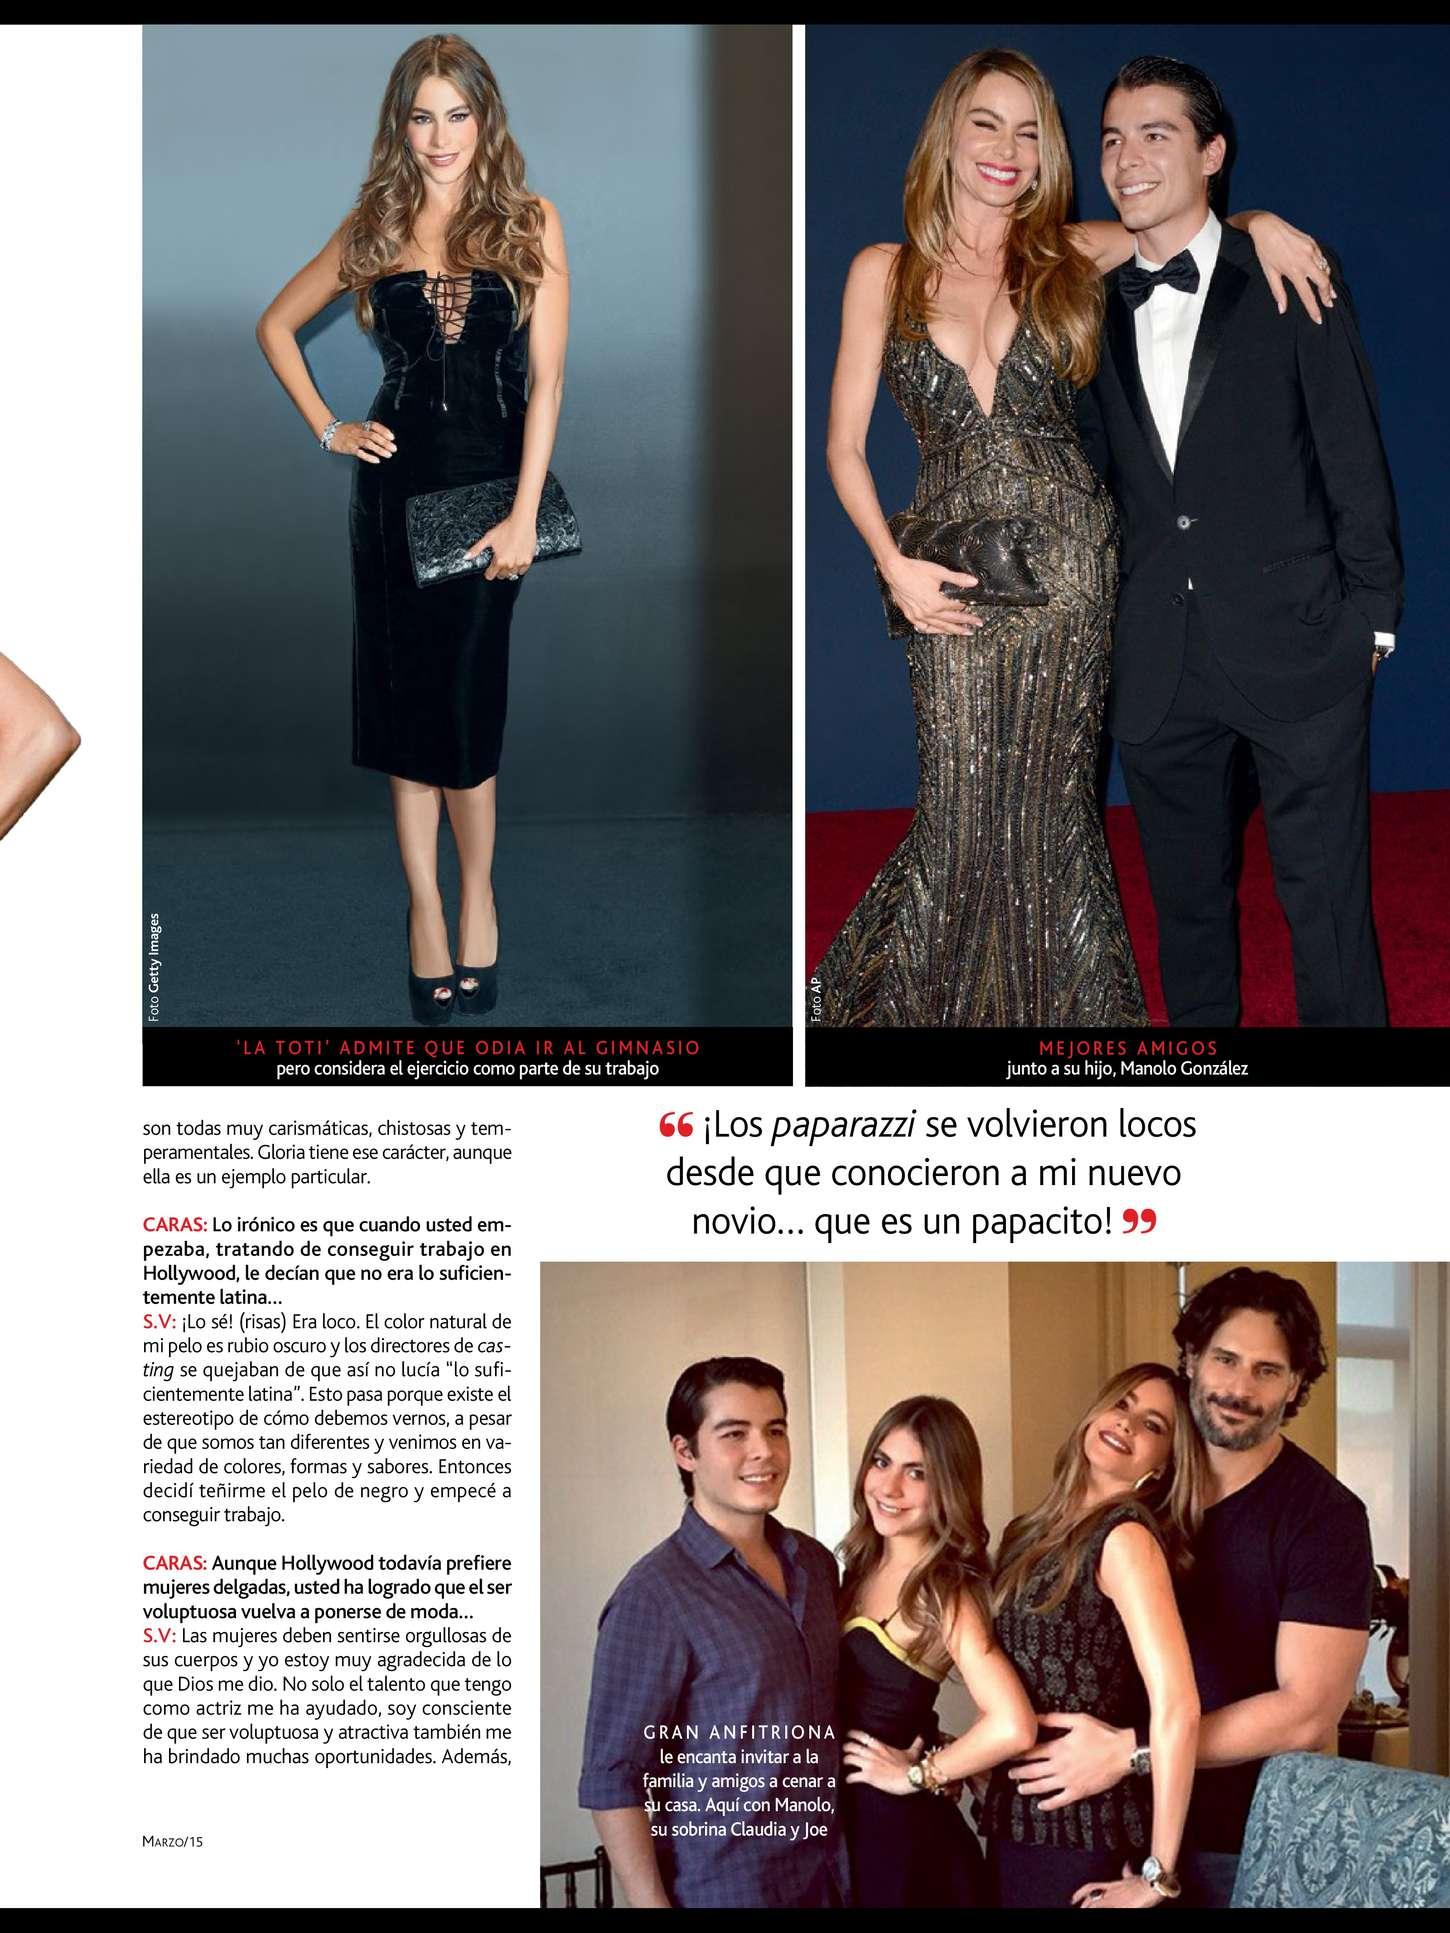 Uncategorized 2015 : Sofía Vergara: Caras Magazine 2015 -03